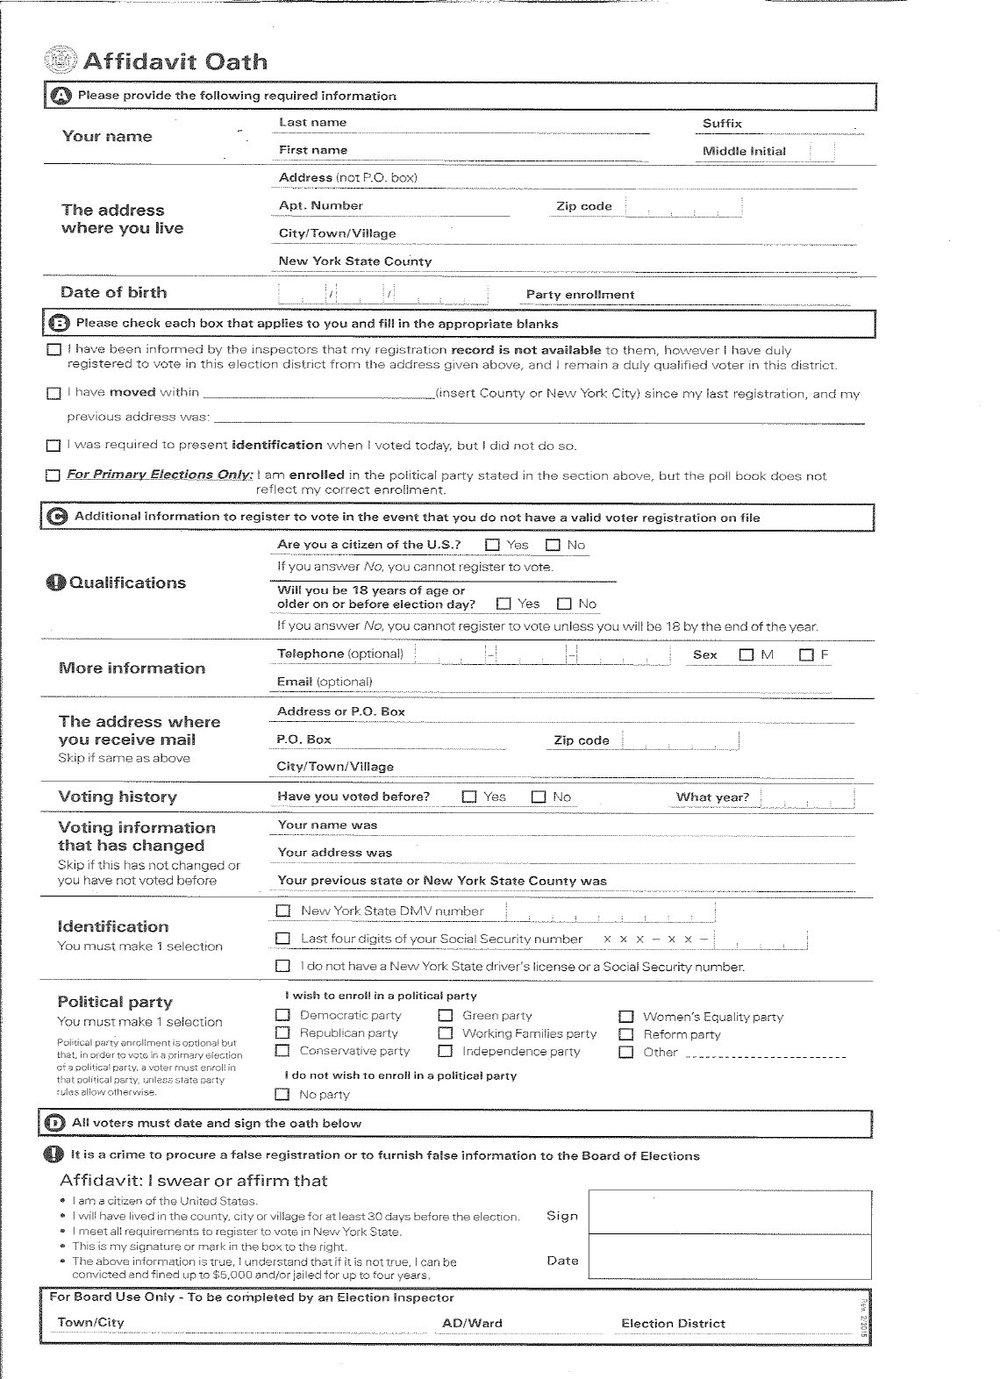 Appendix B: Affidavit Ballot Envelope